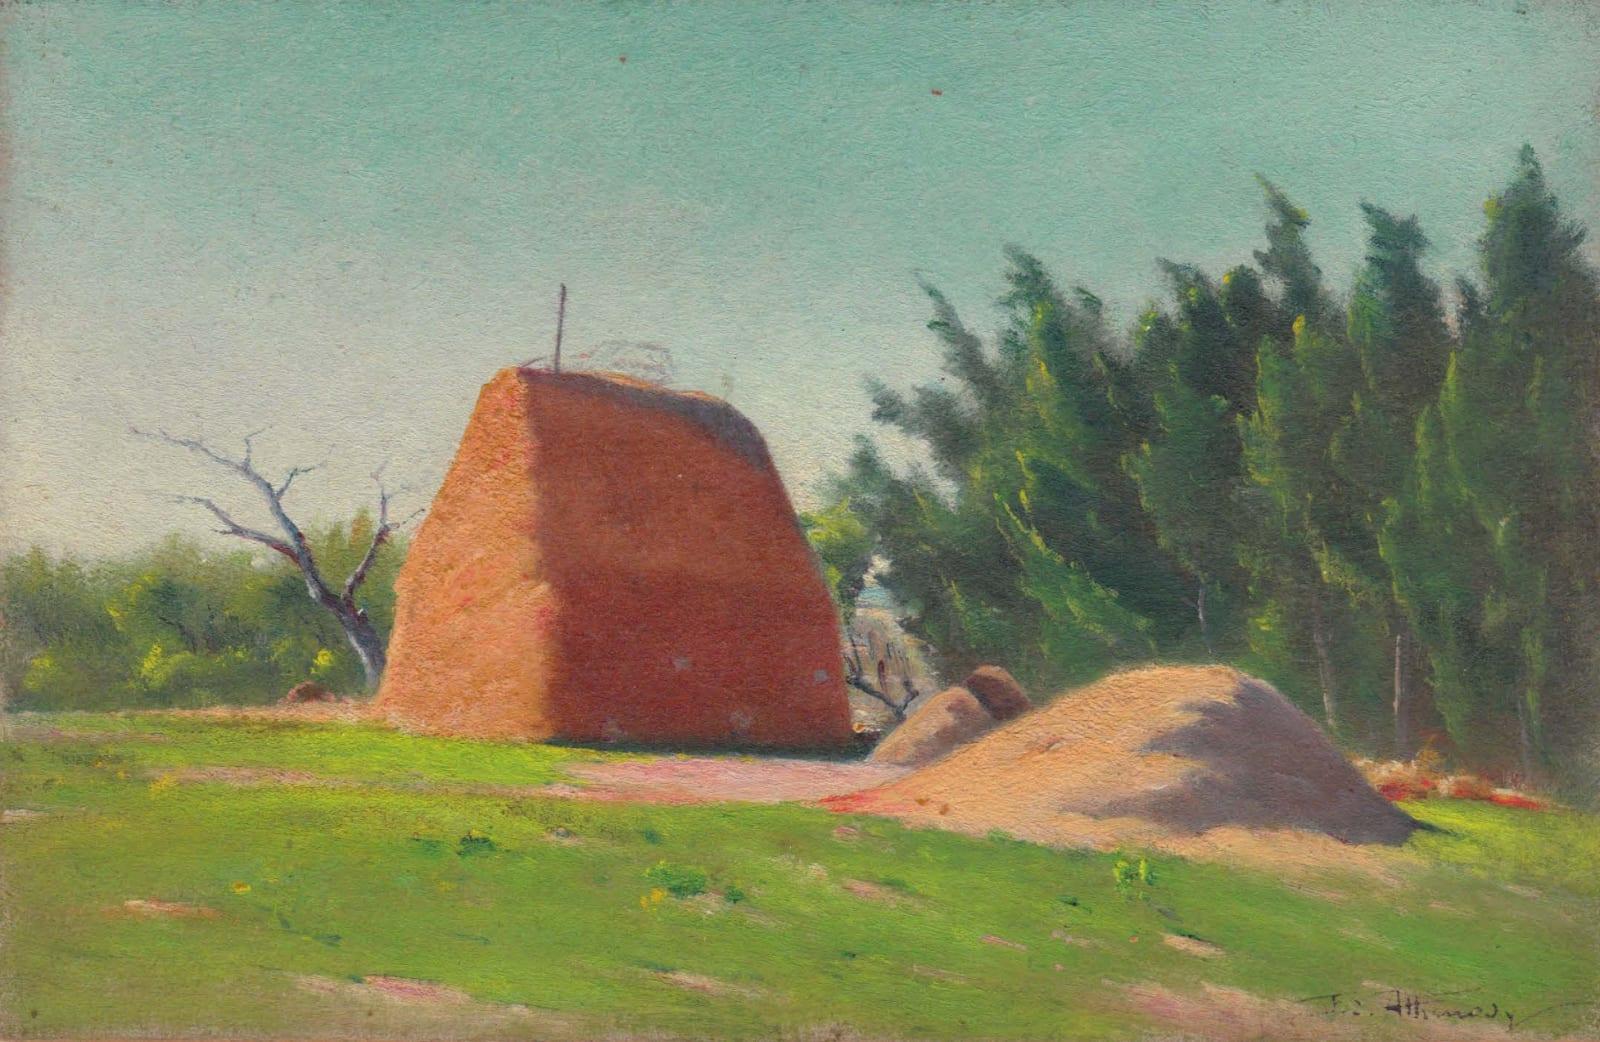 EDOUARD ATHÉNOSY, Haystack with cypress, 1899